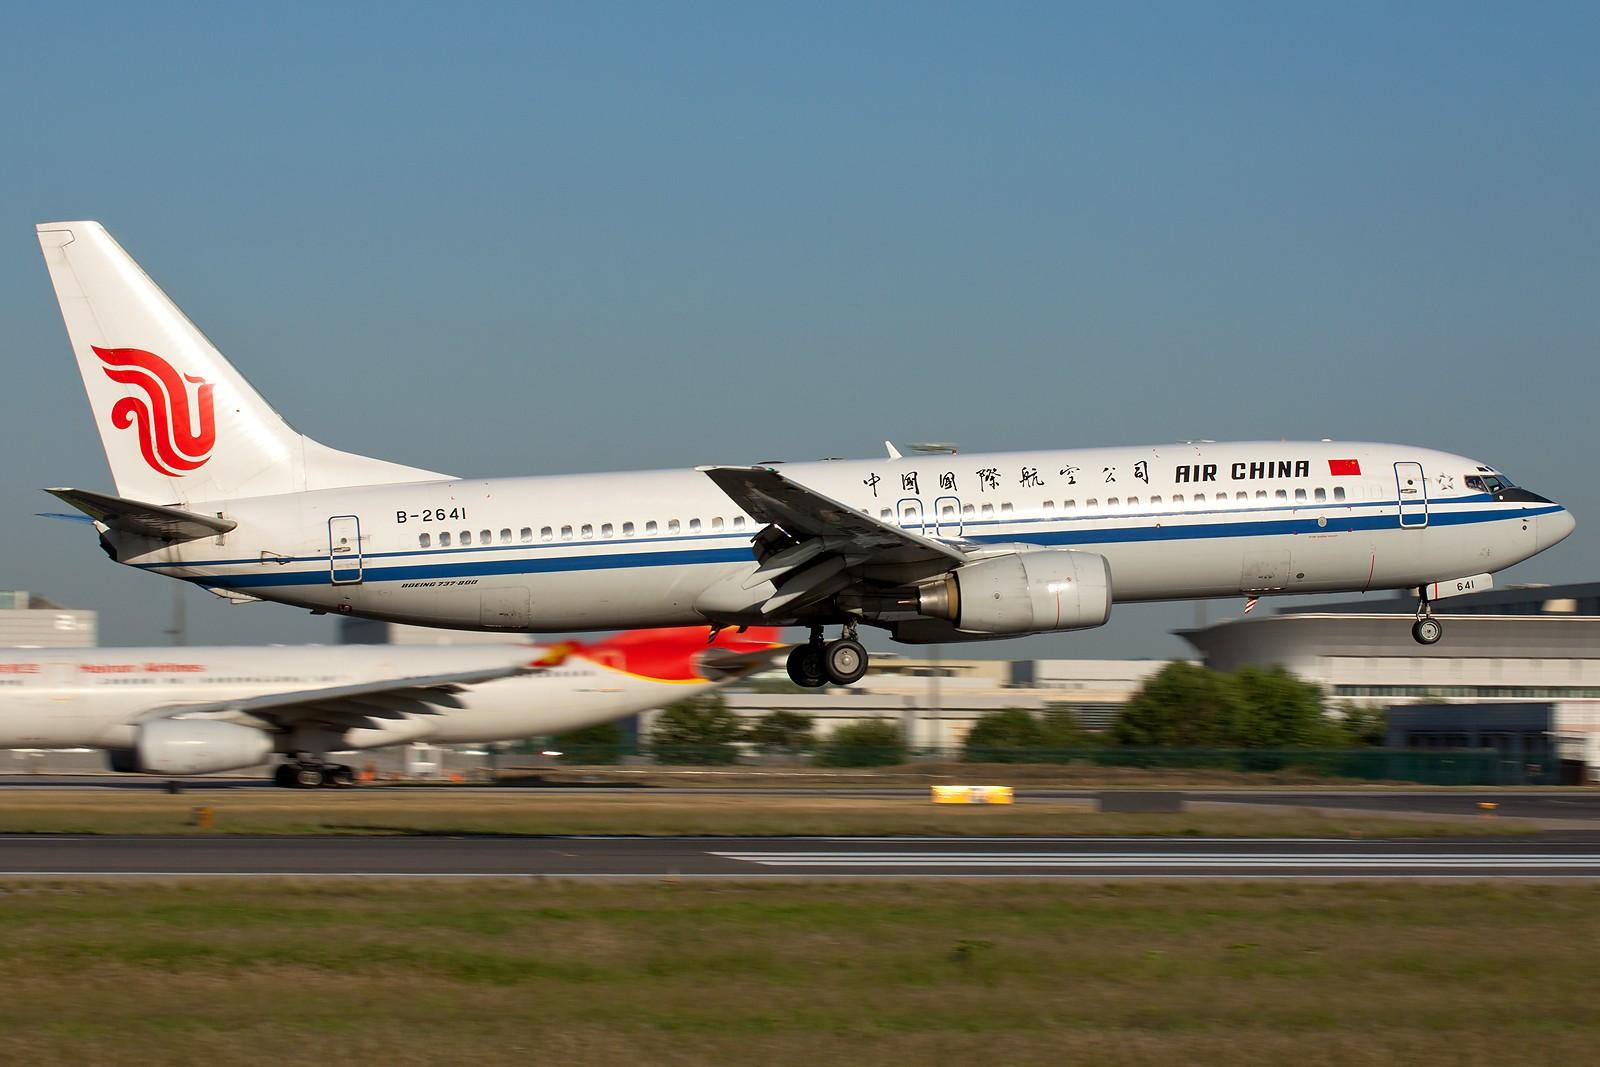 Re:[原创]国航一组 B737&A320系列 [10pics] BOEING 737-800 B-2641 中国北京首都机场